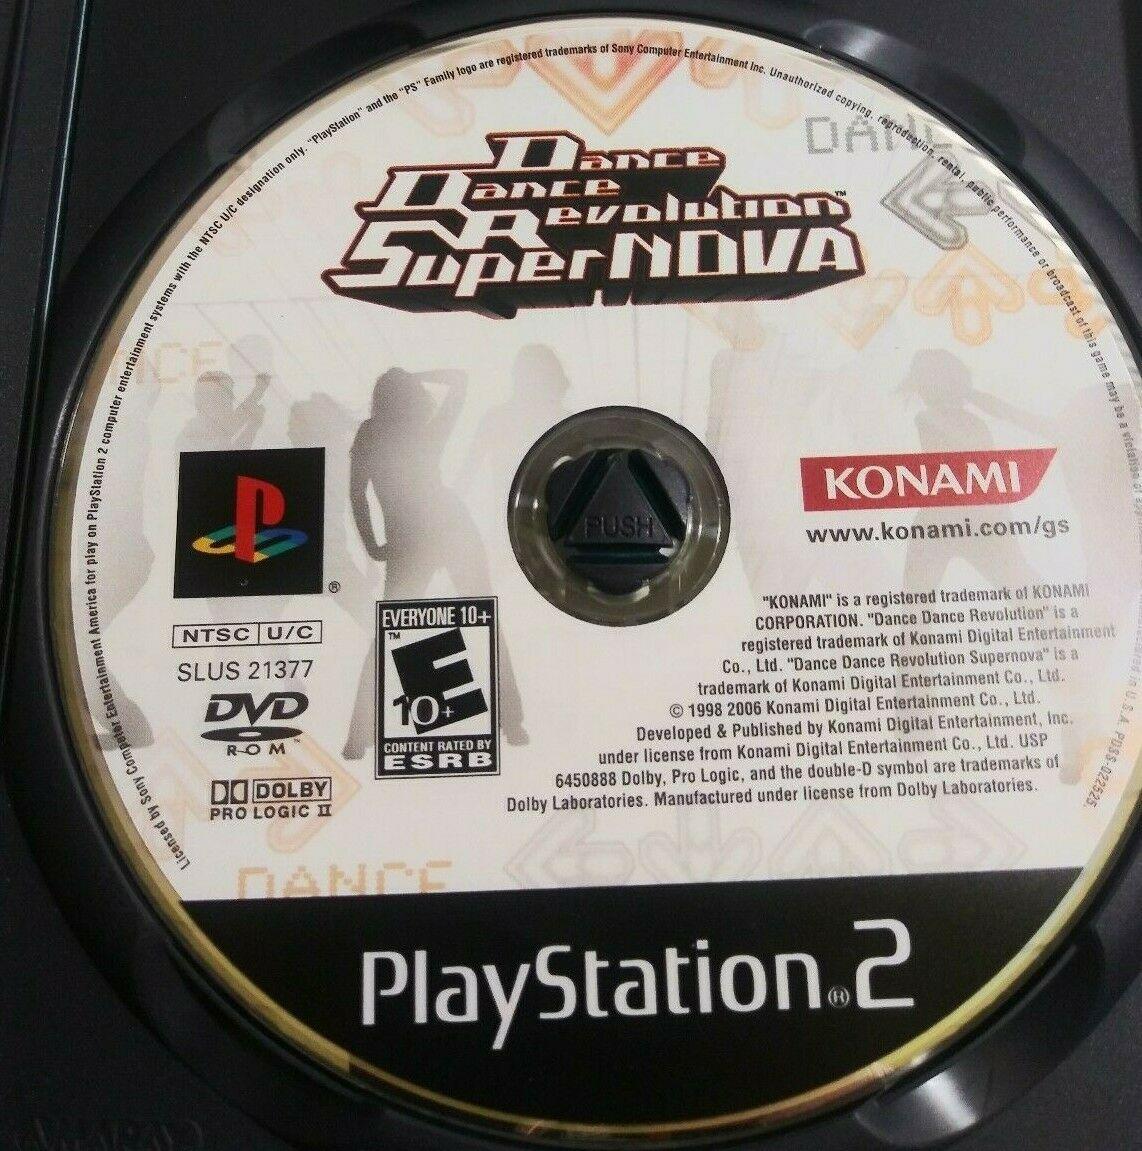 Dance Dance Revolution Super Nova Sony PlayStation 2, 2006 image 3